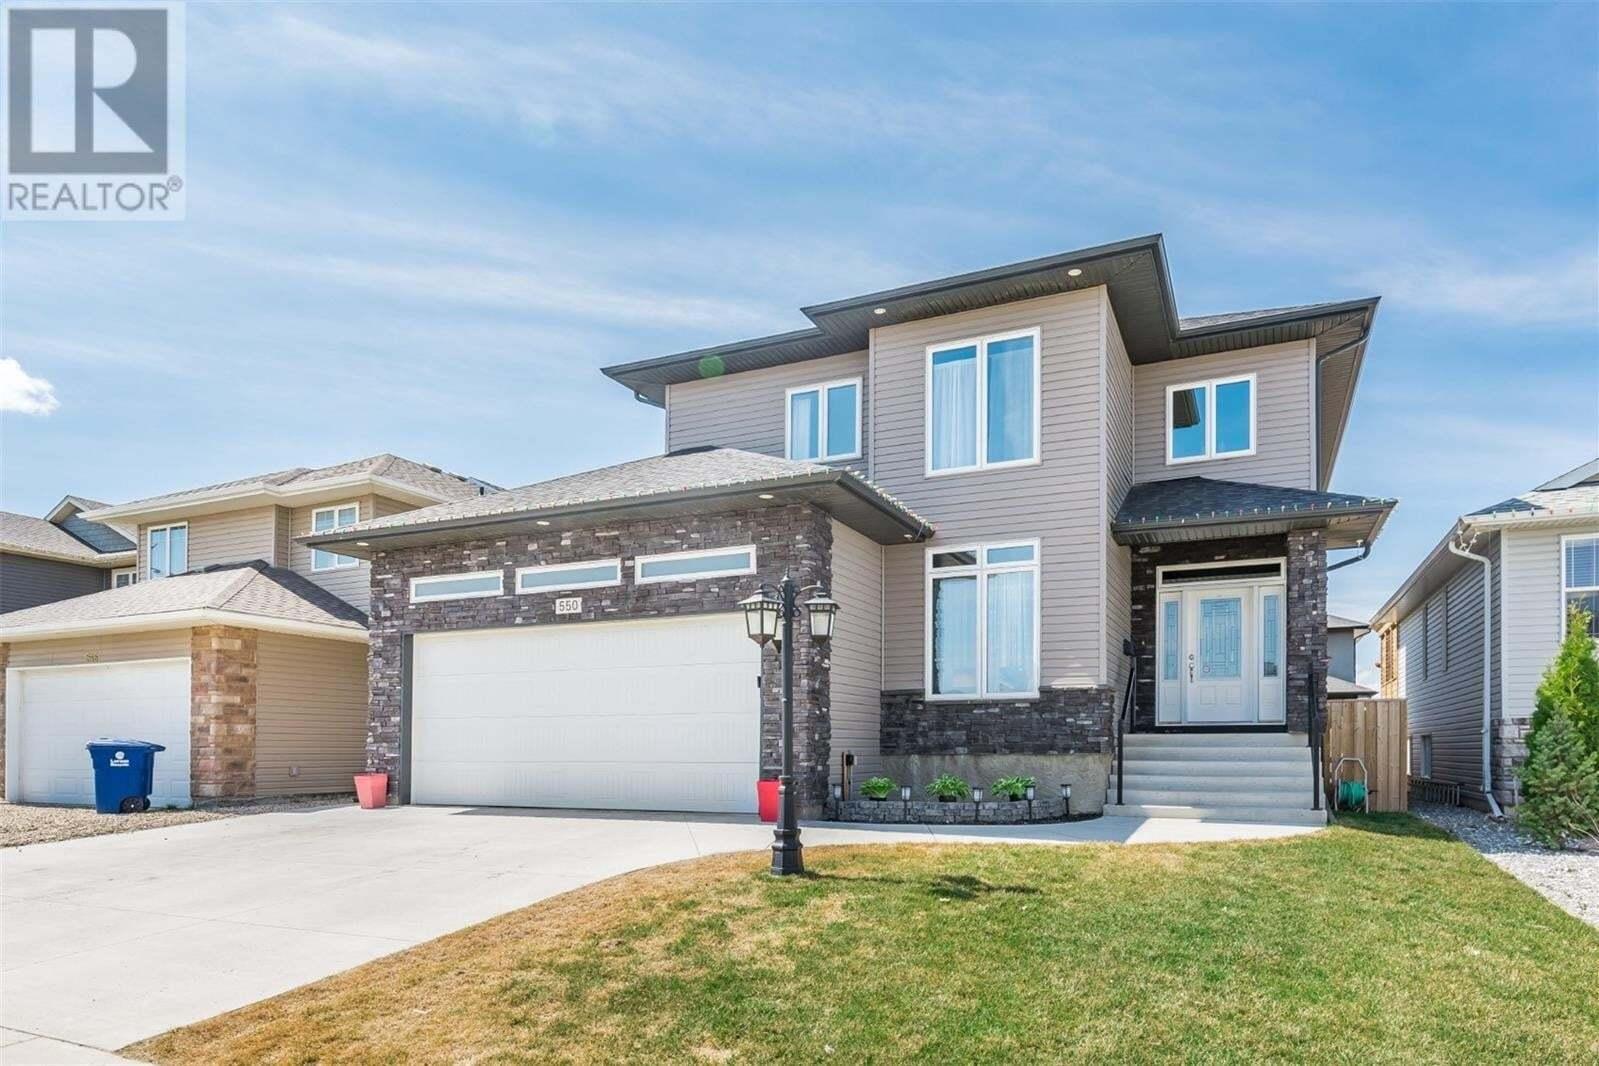 House for sale at 550 Evergreen Blvd Saskatoon Saskatchewan - MLS: SK814784